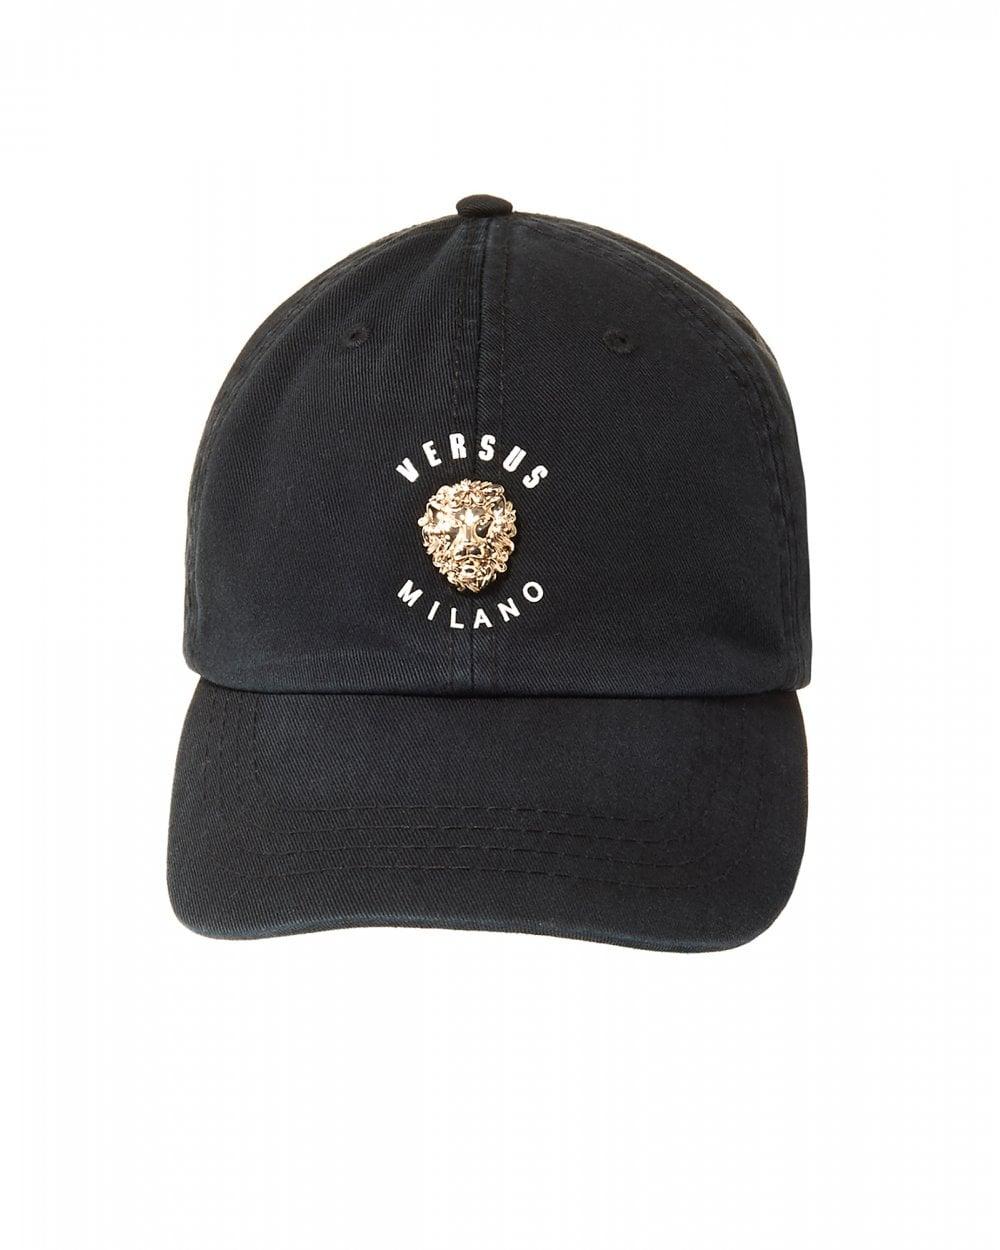 22e096973943 Versus Versace Mens Metal Lions Head Black Baseball Cap